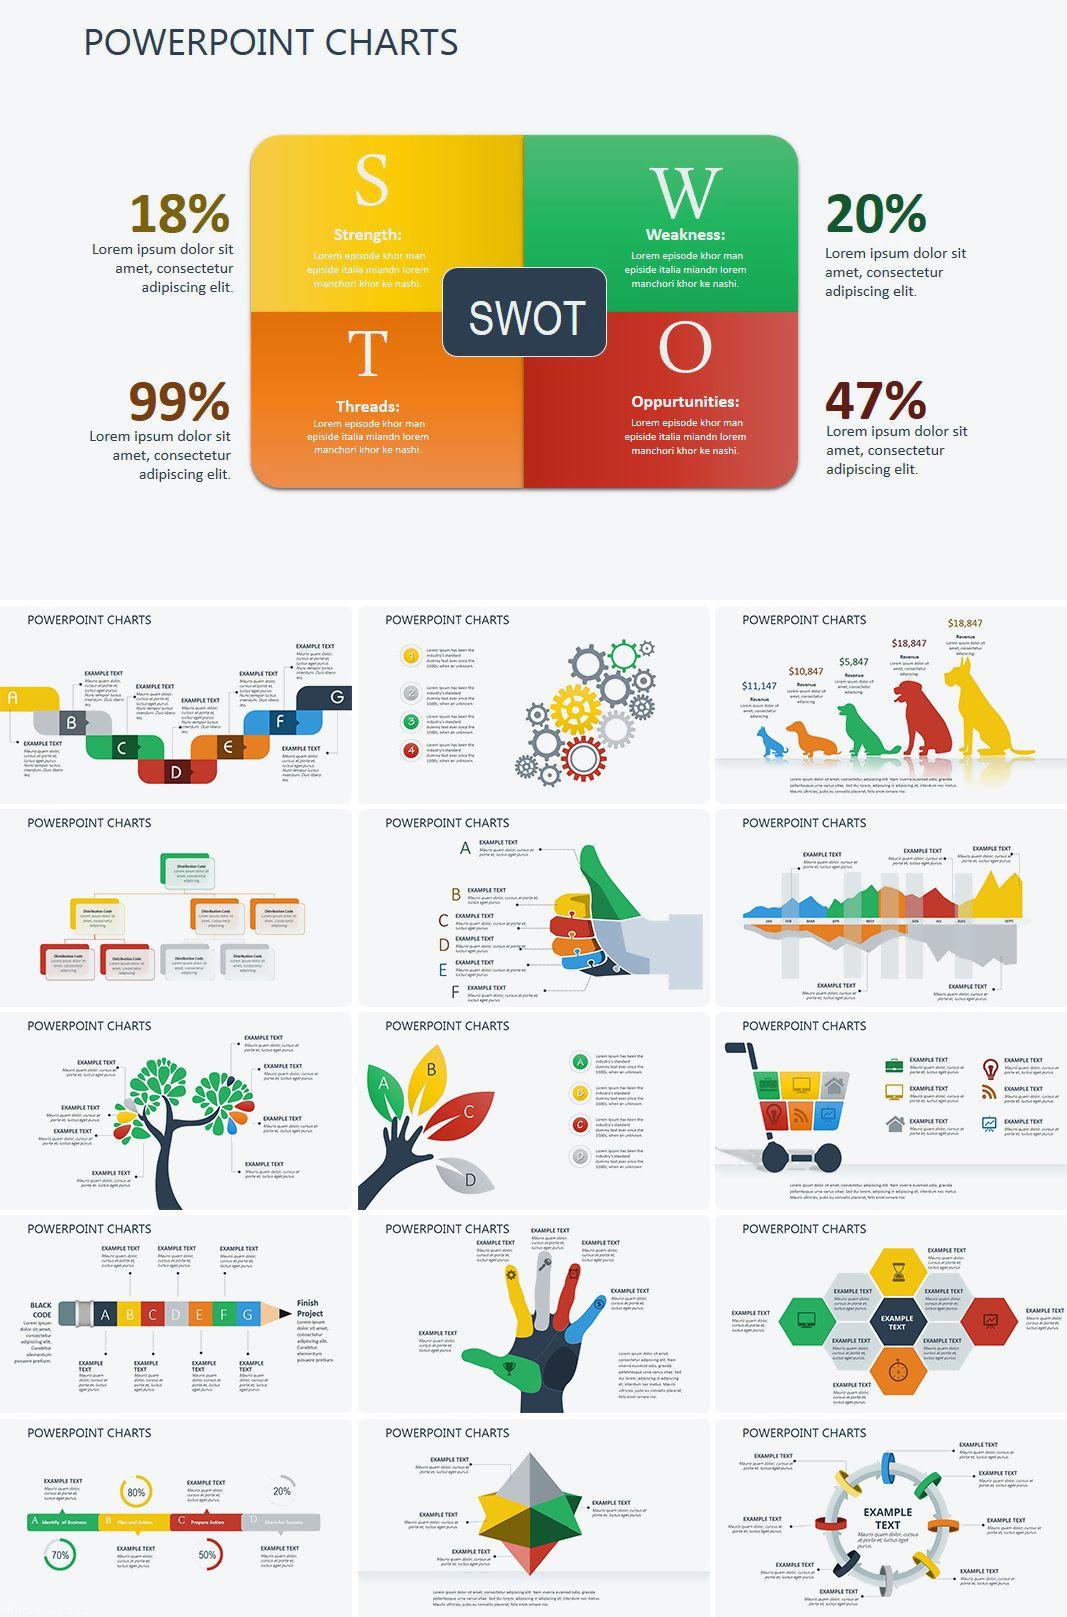 Strategic Analysis Powerpoint Charts Powerpoint Charts Powerpoint Chart Templates Infographic Powerpoint